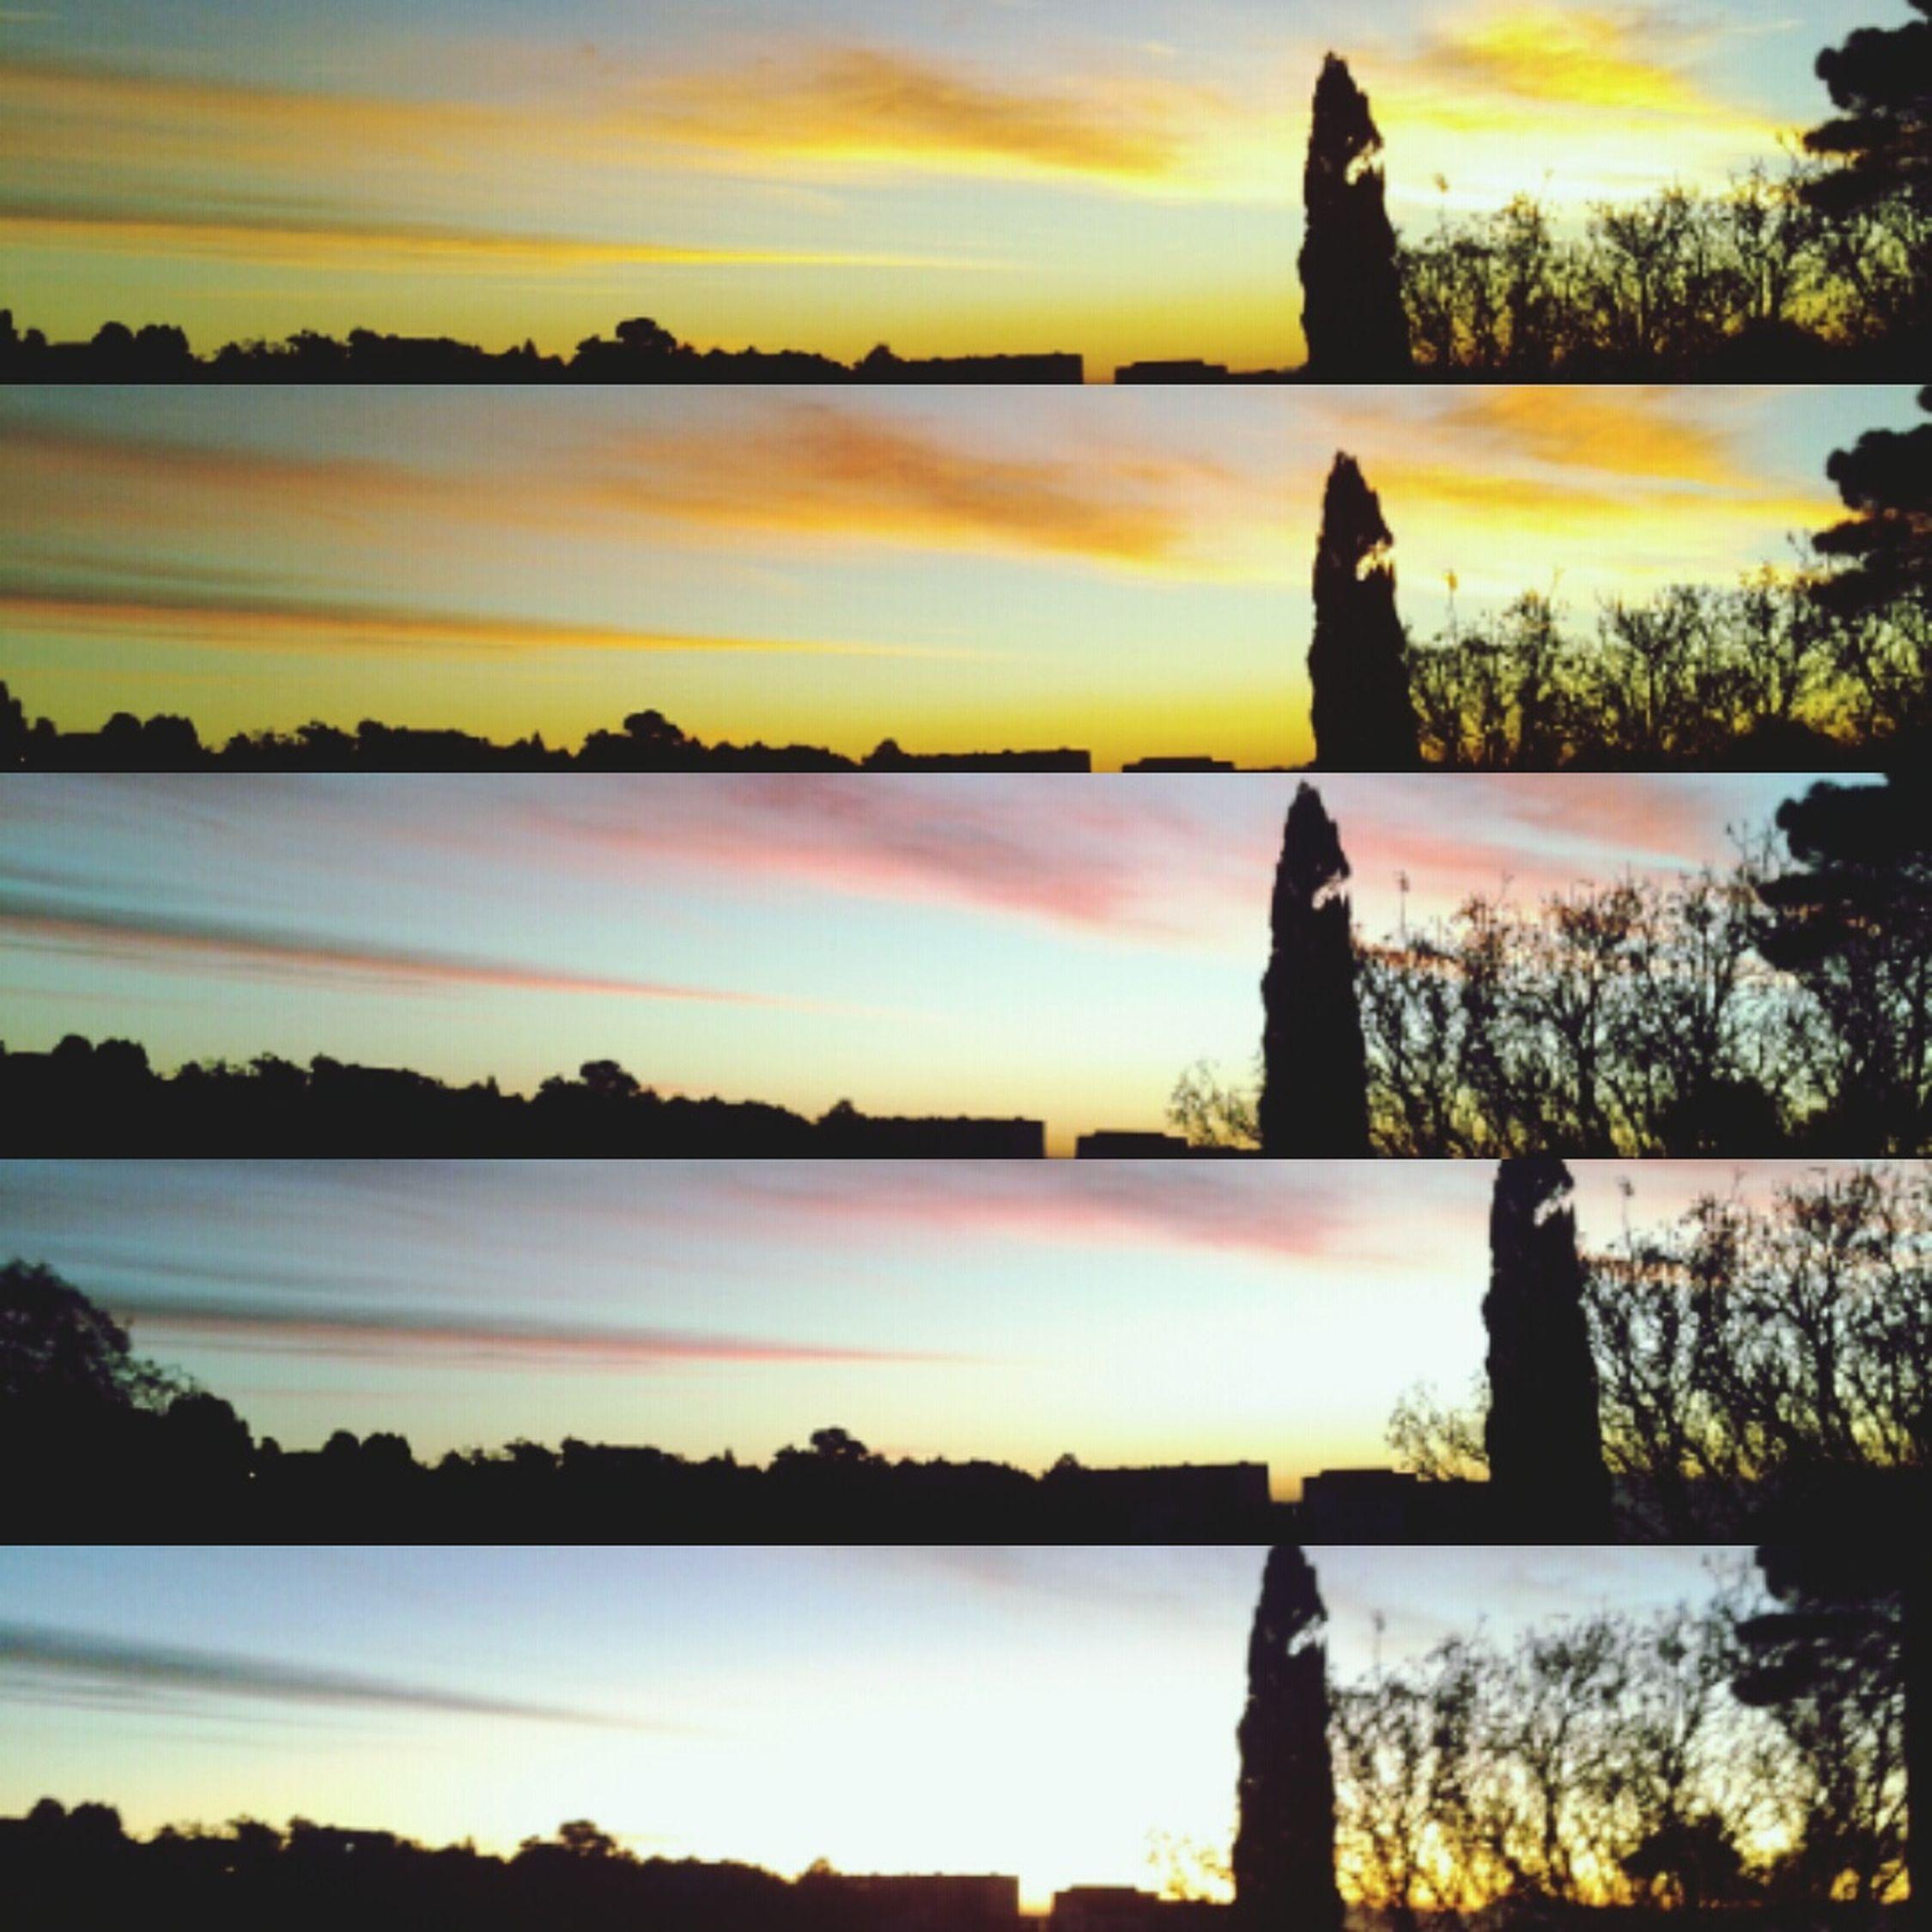 Showcase: December Taking Photos Enjoying Life Hello World Early Morning Earlyclass Bouzareah